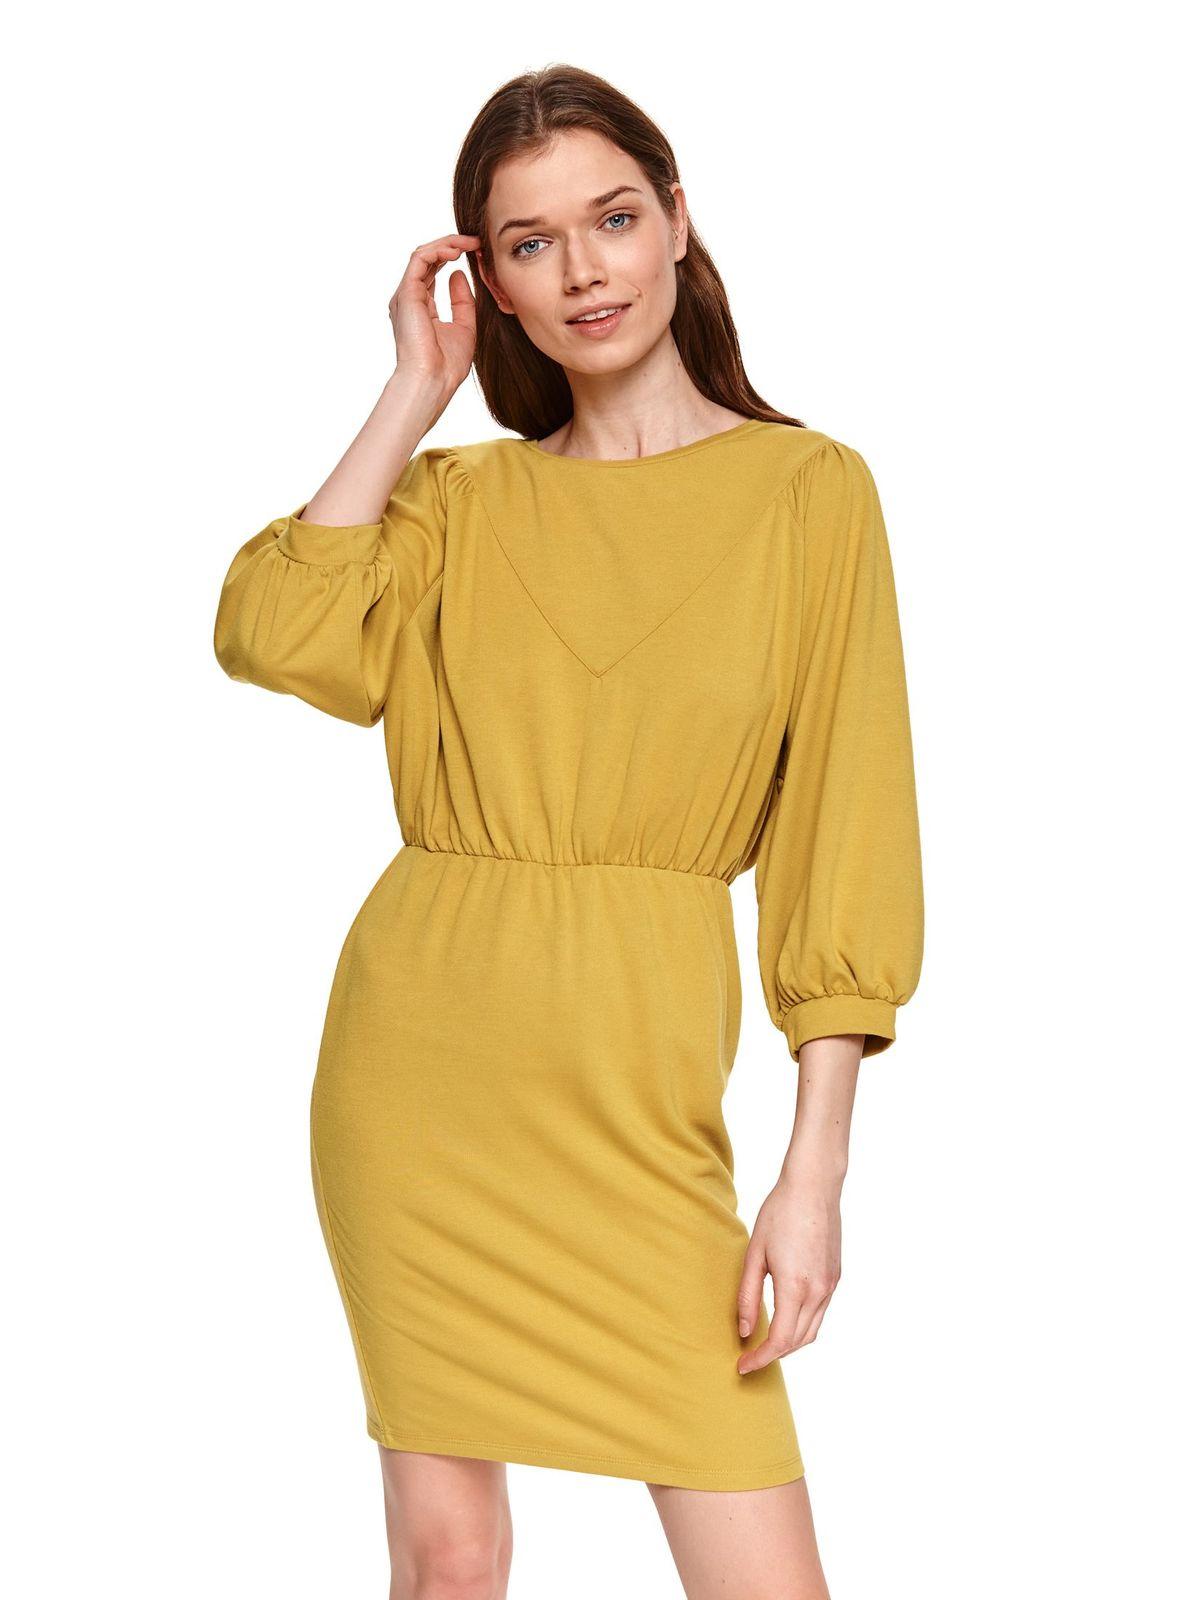 Yellow dress short cut pencil large sleeves